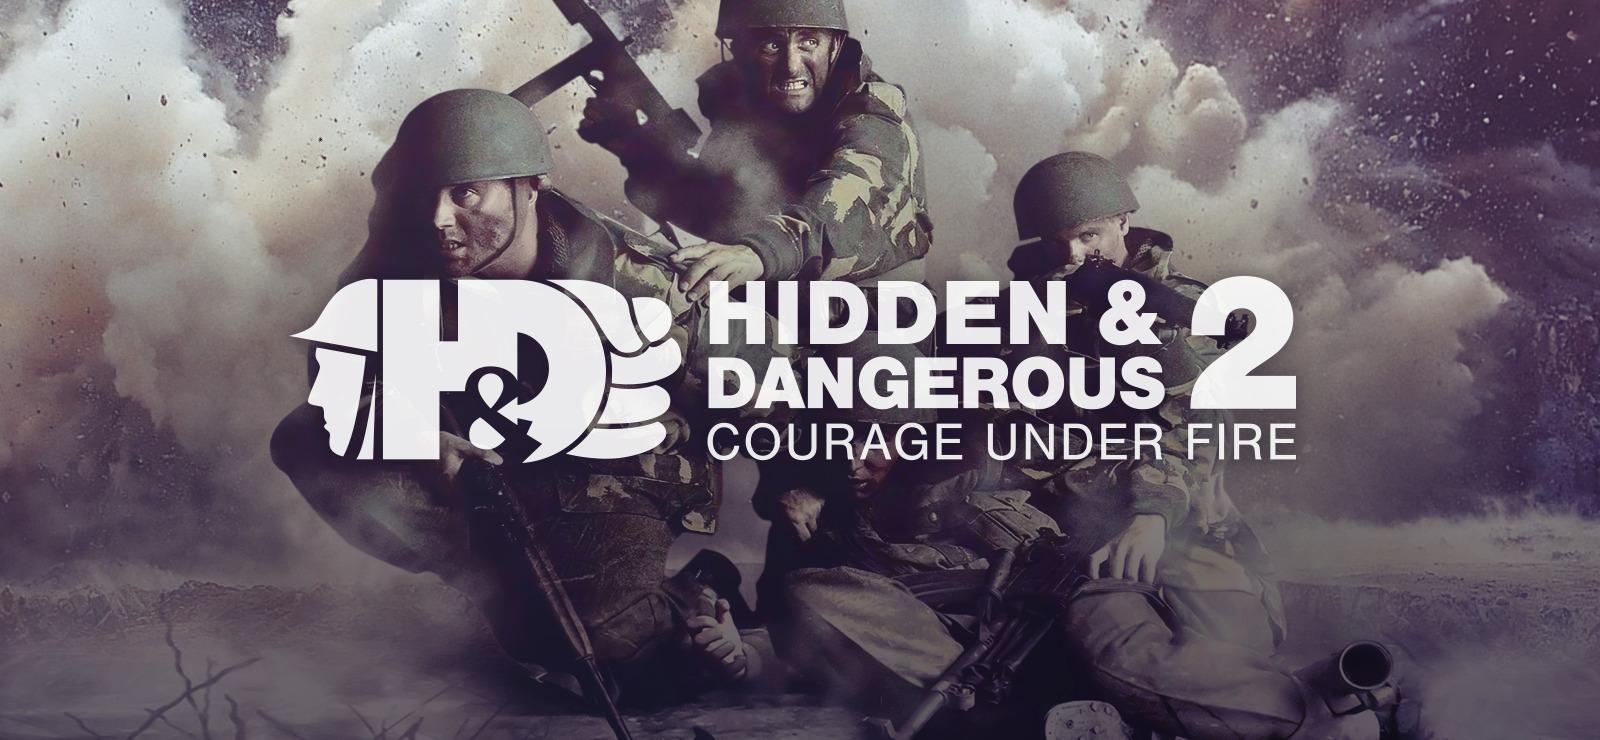 courage under fire book pdf